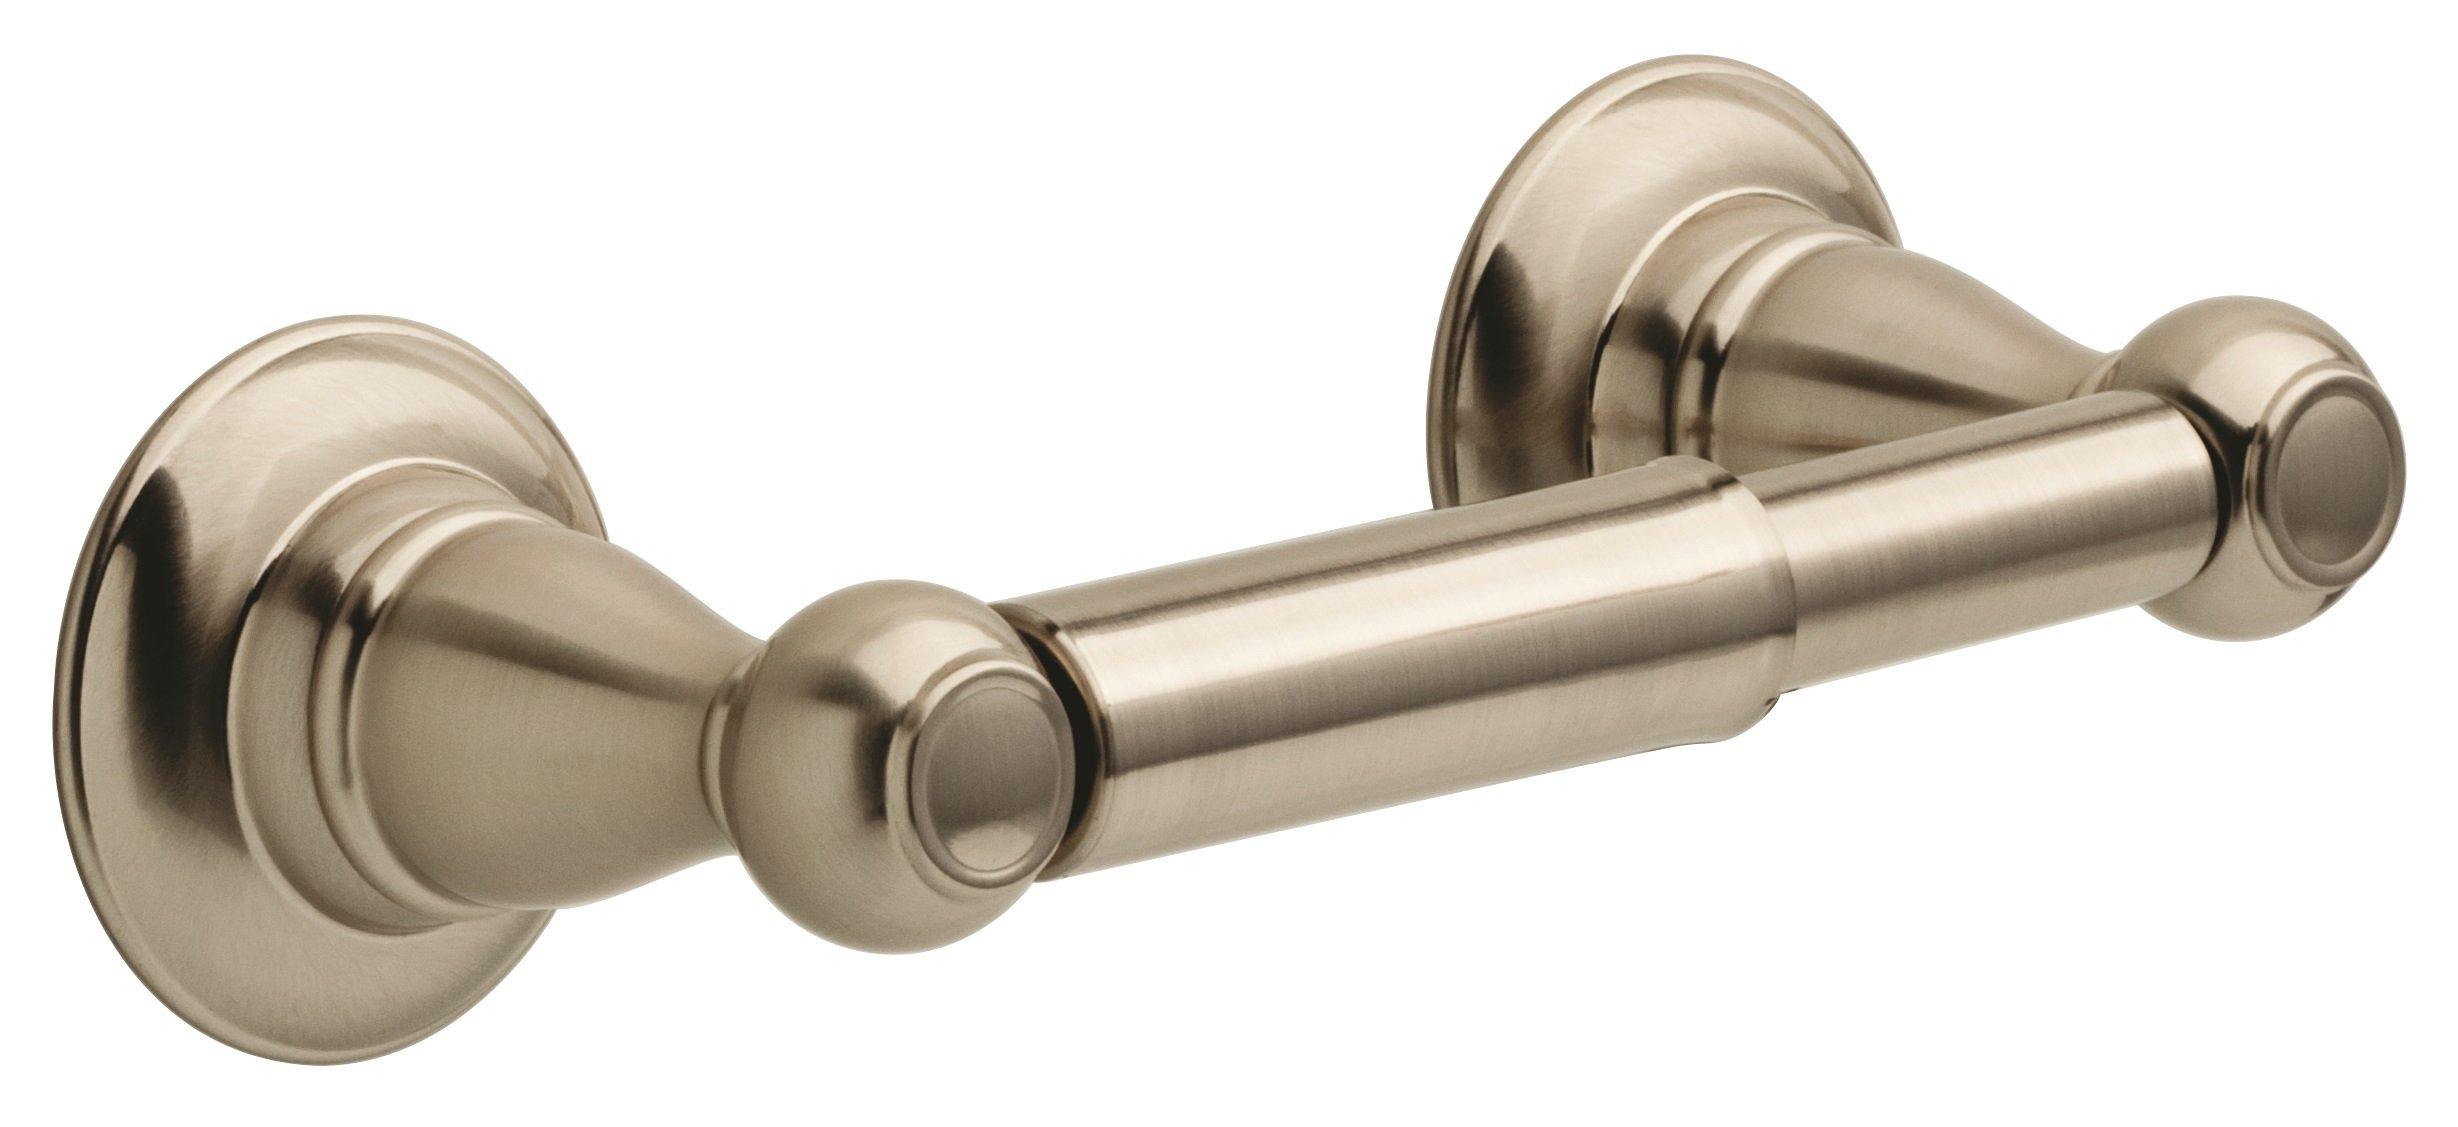 Delta PTR50-BN Porter Bath Hardware Accessory Toilet Paper Holder, SpotShield Brushed Nickel by DELTA FAUCET